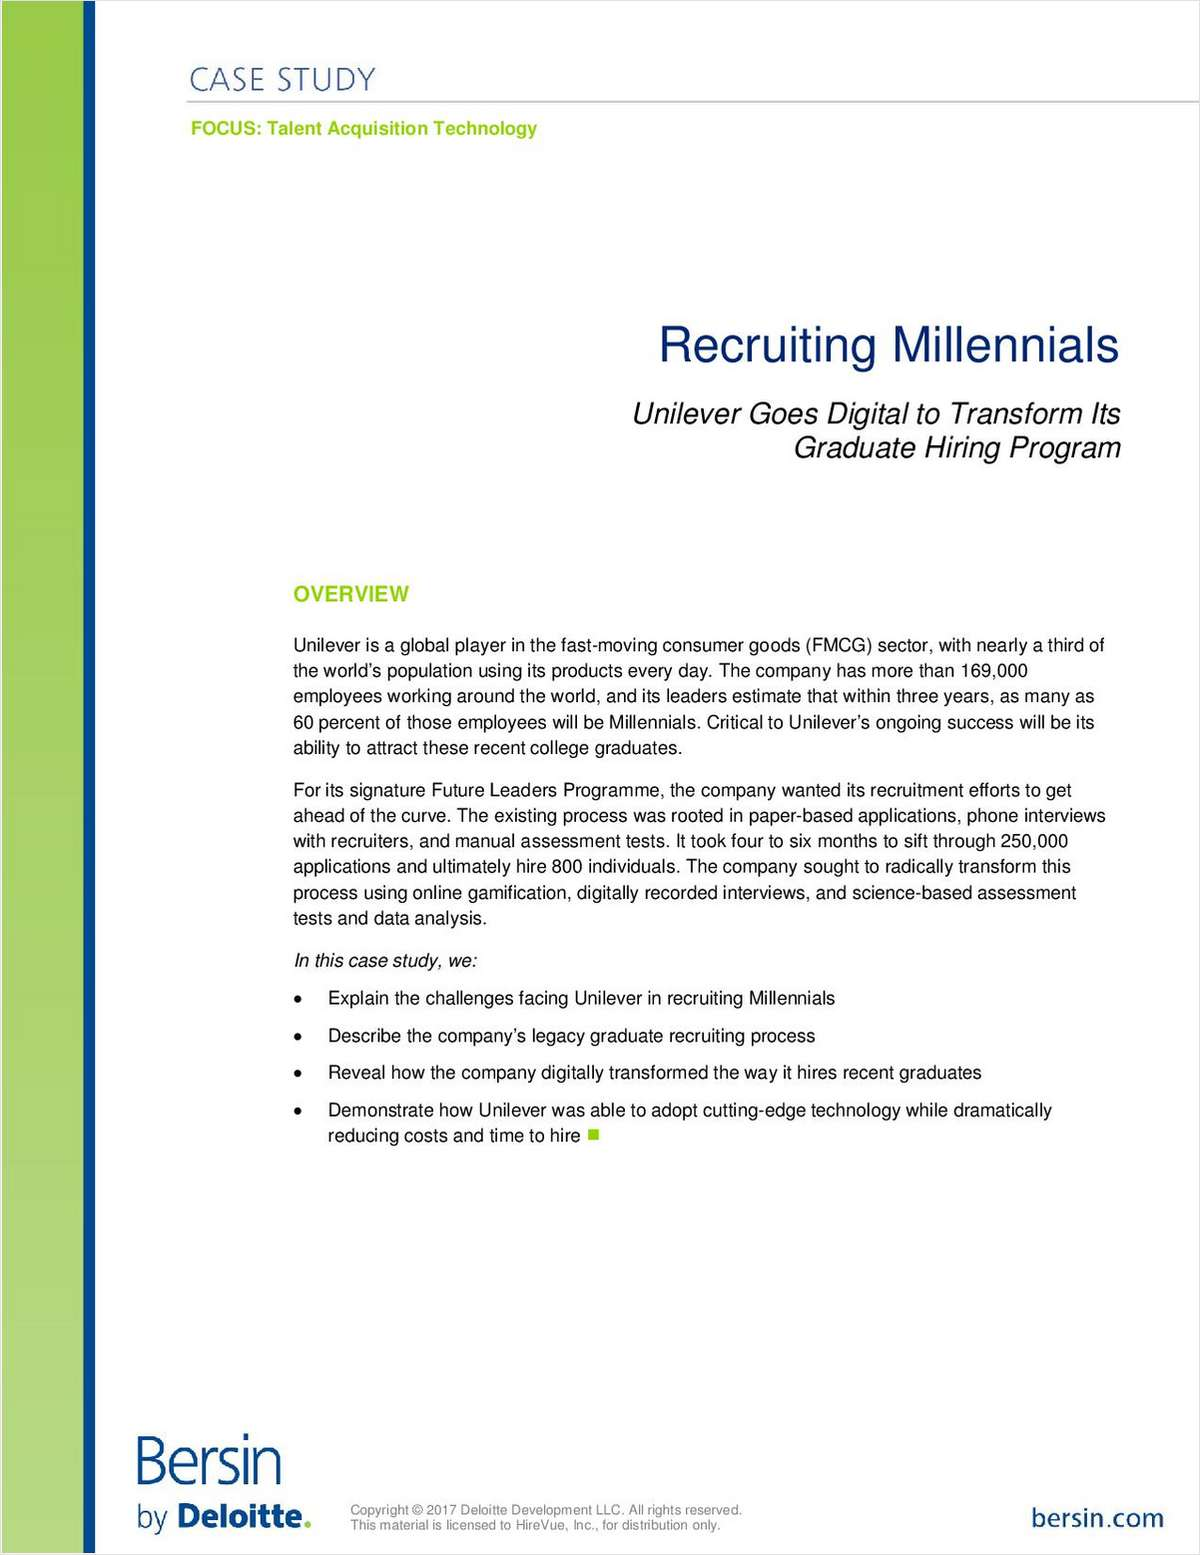 Recruiting Millennials: Unilever Goes Digital to Transform Its Graduate Hiring Program